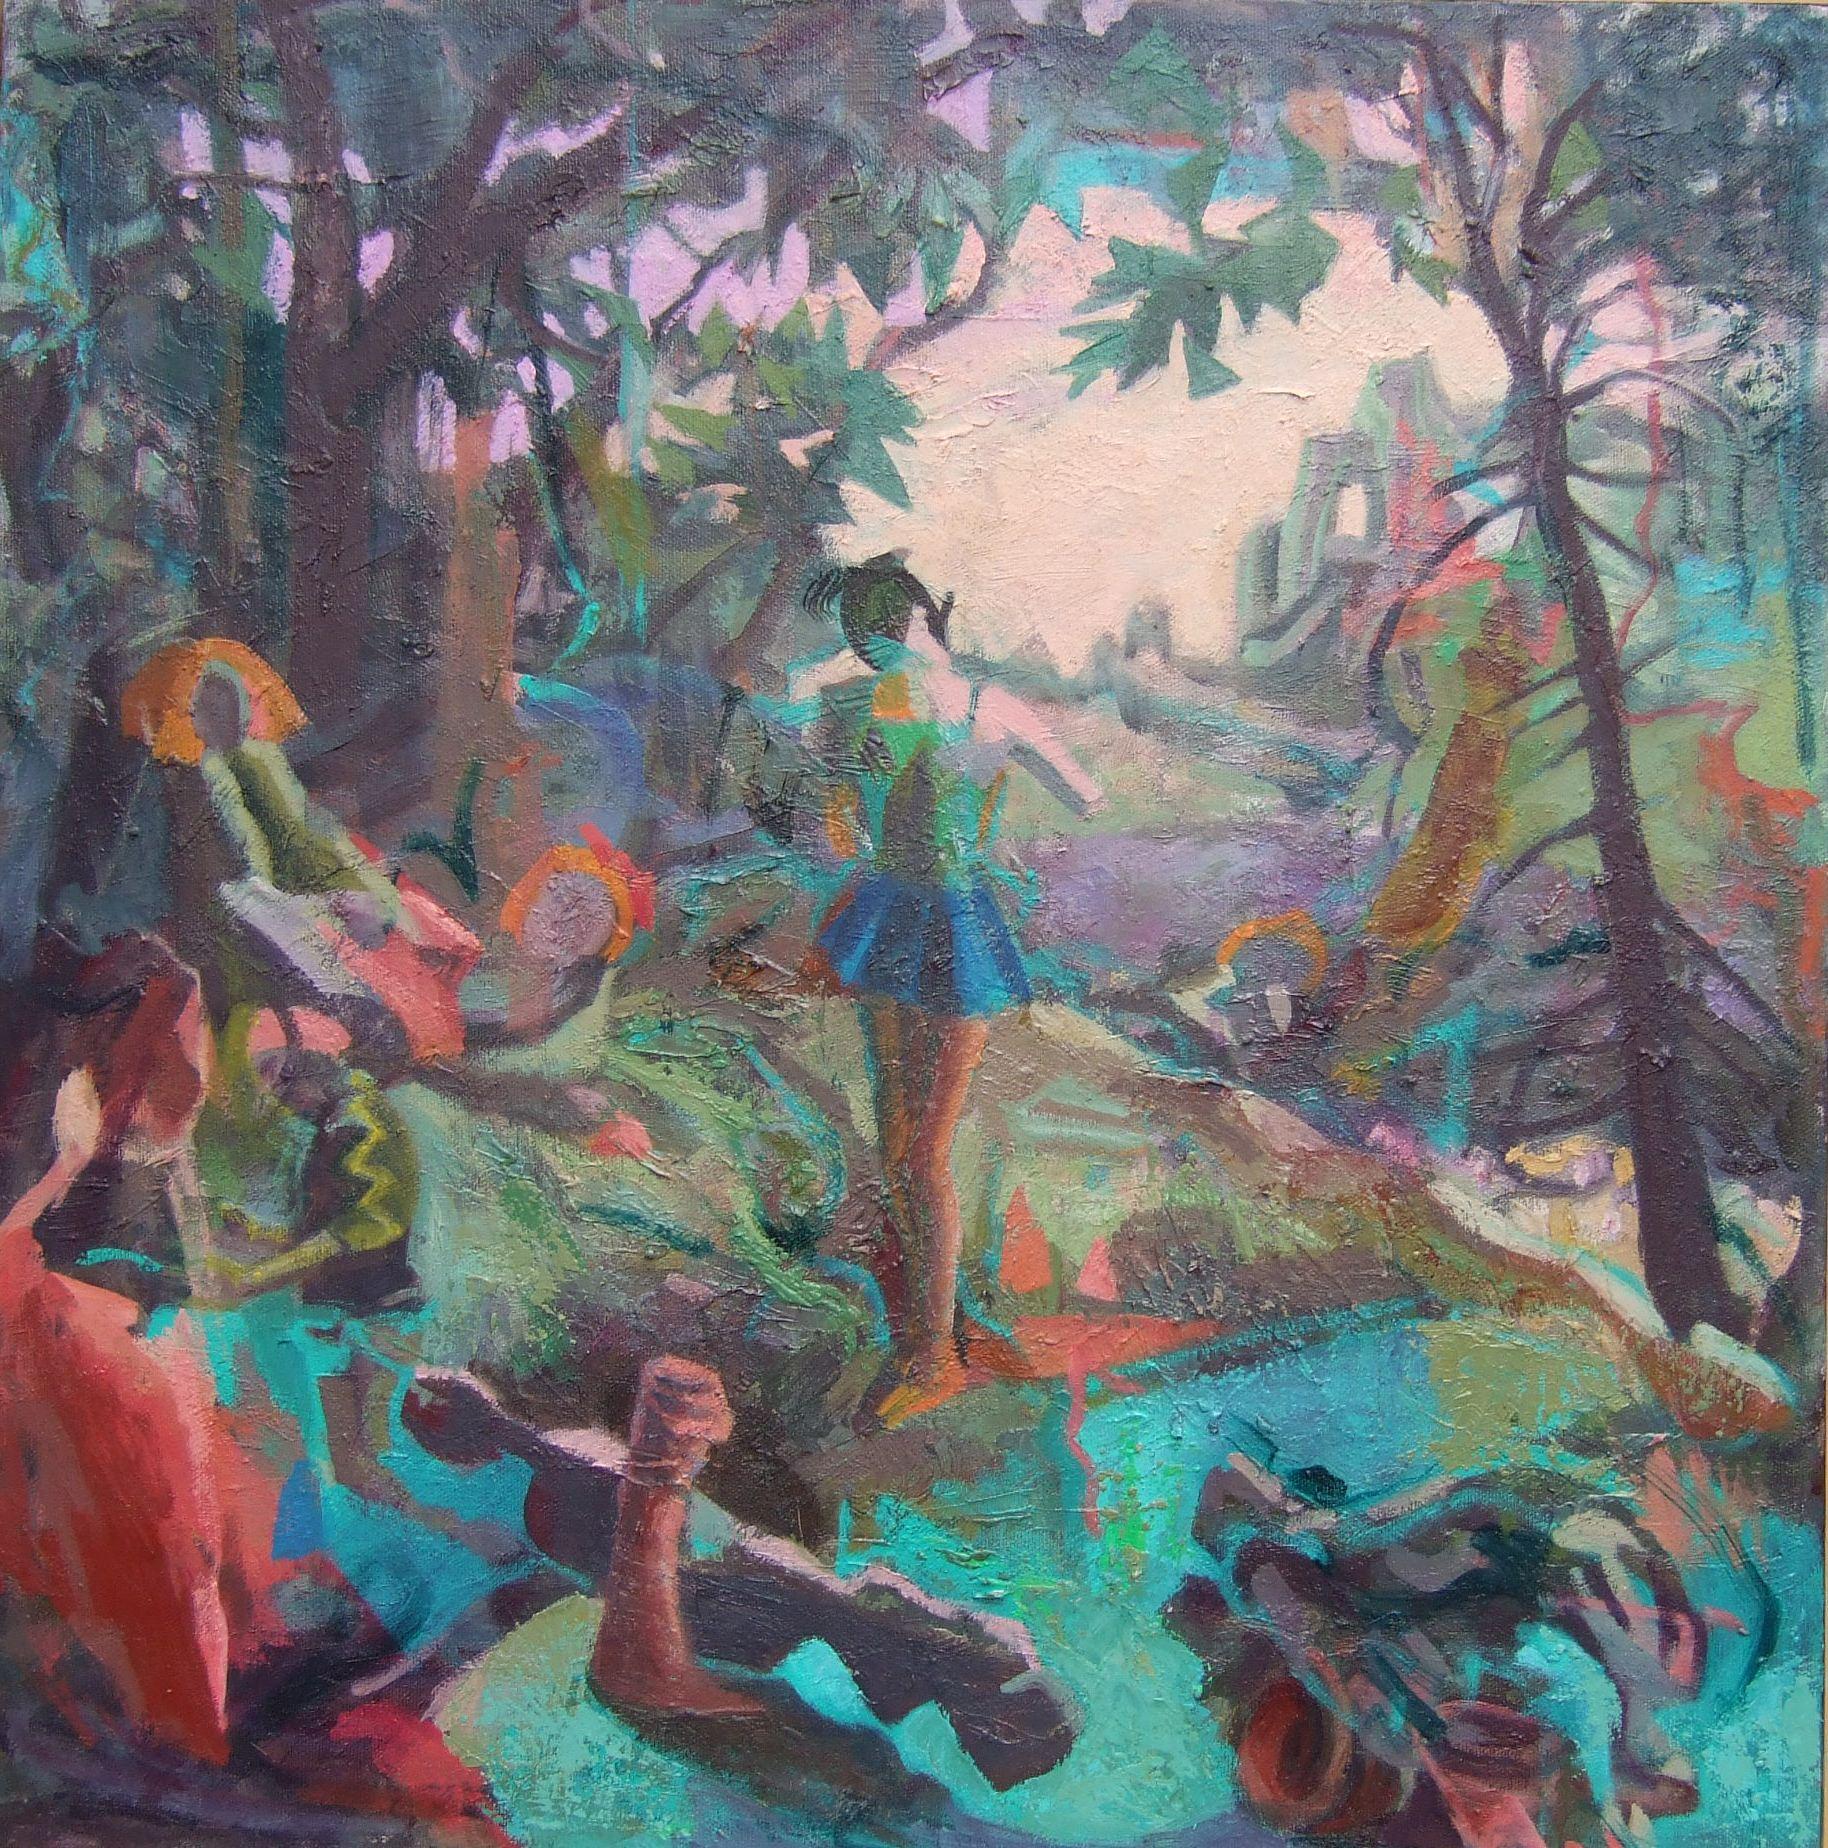 """Perils"", 24"" x 24"", oil on canvas"